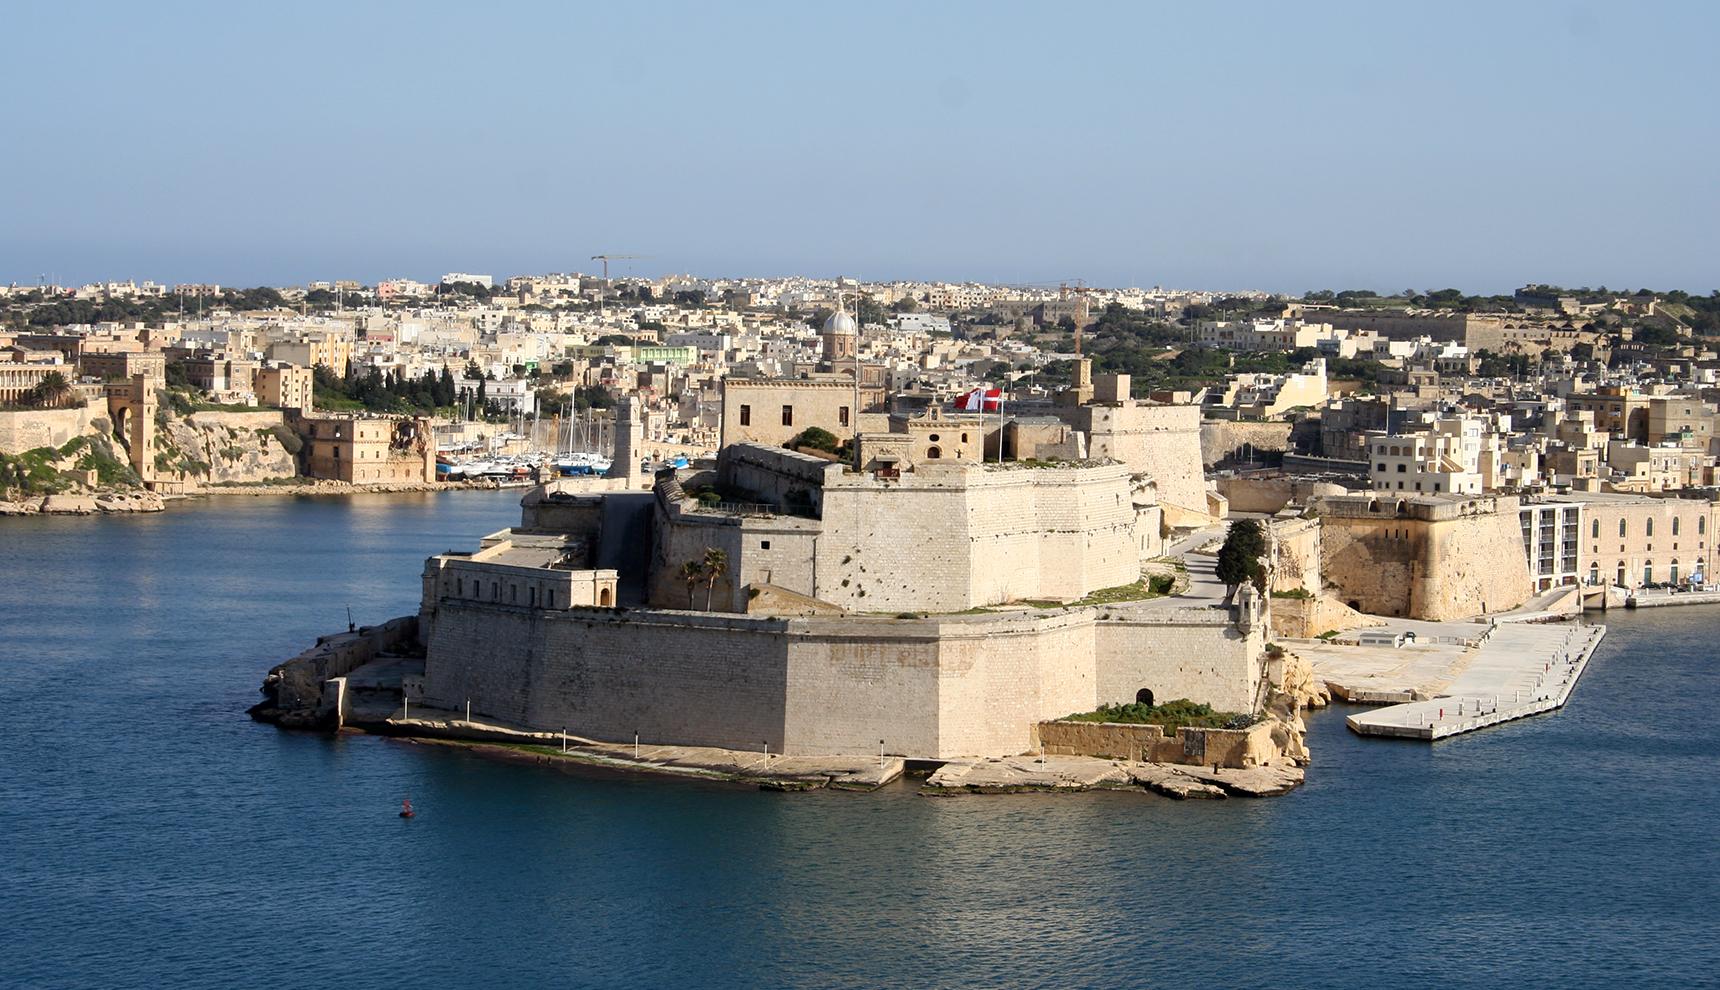 St Elmo's Fort Valetta